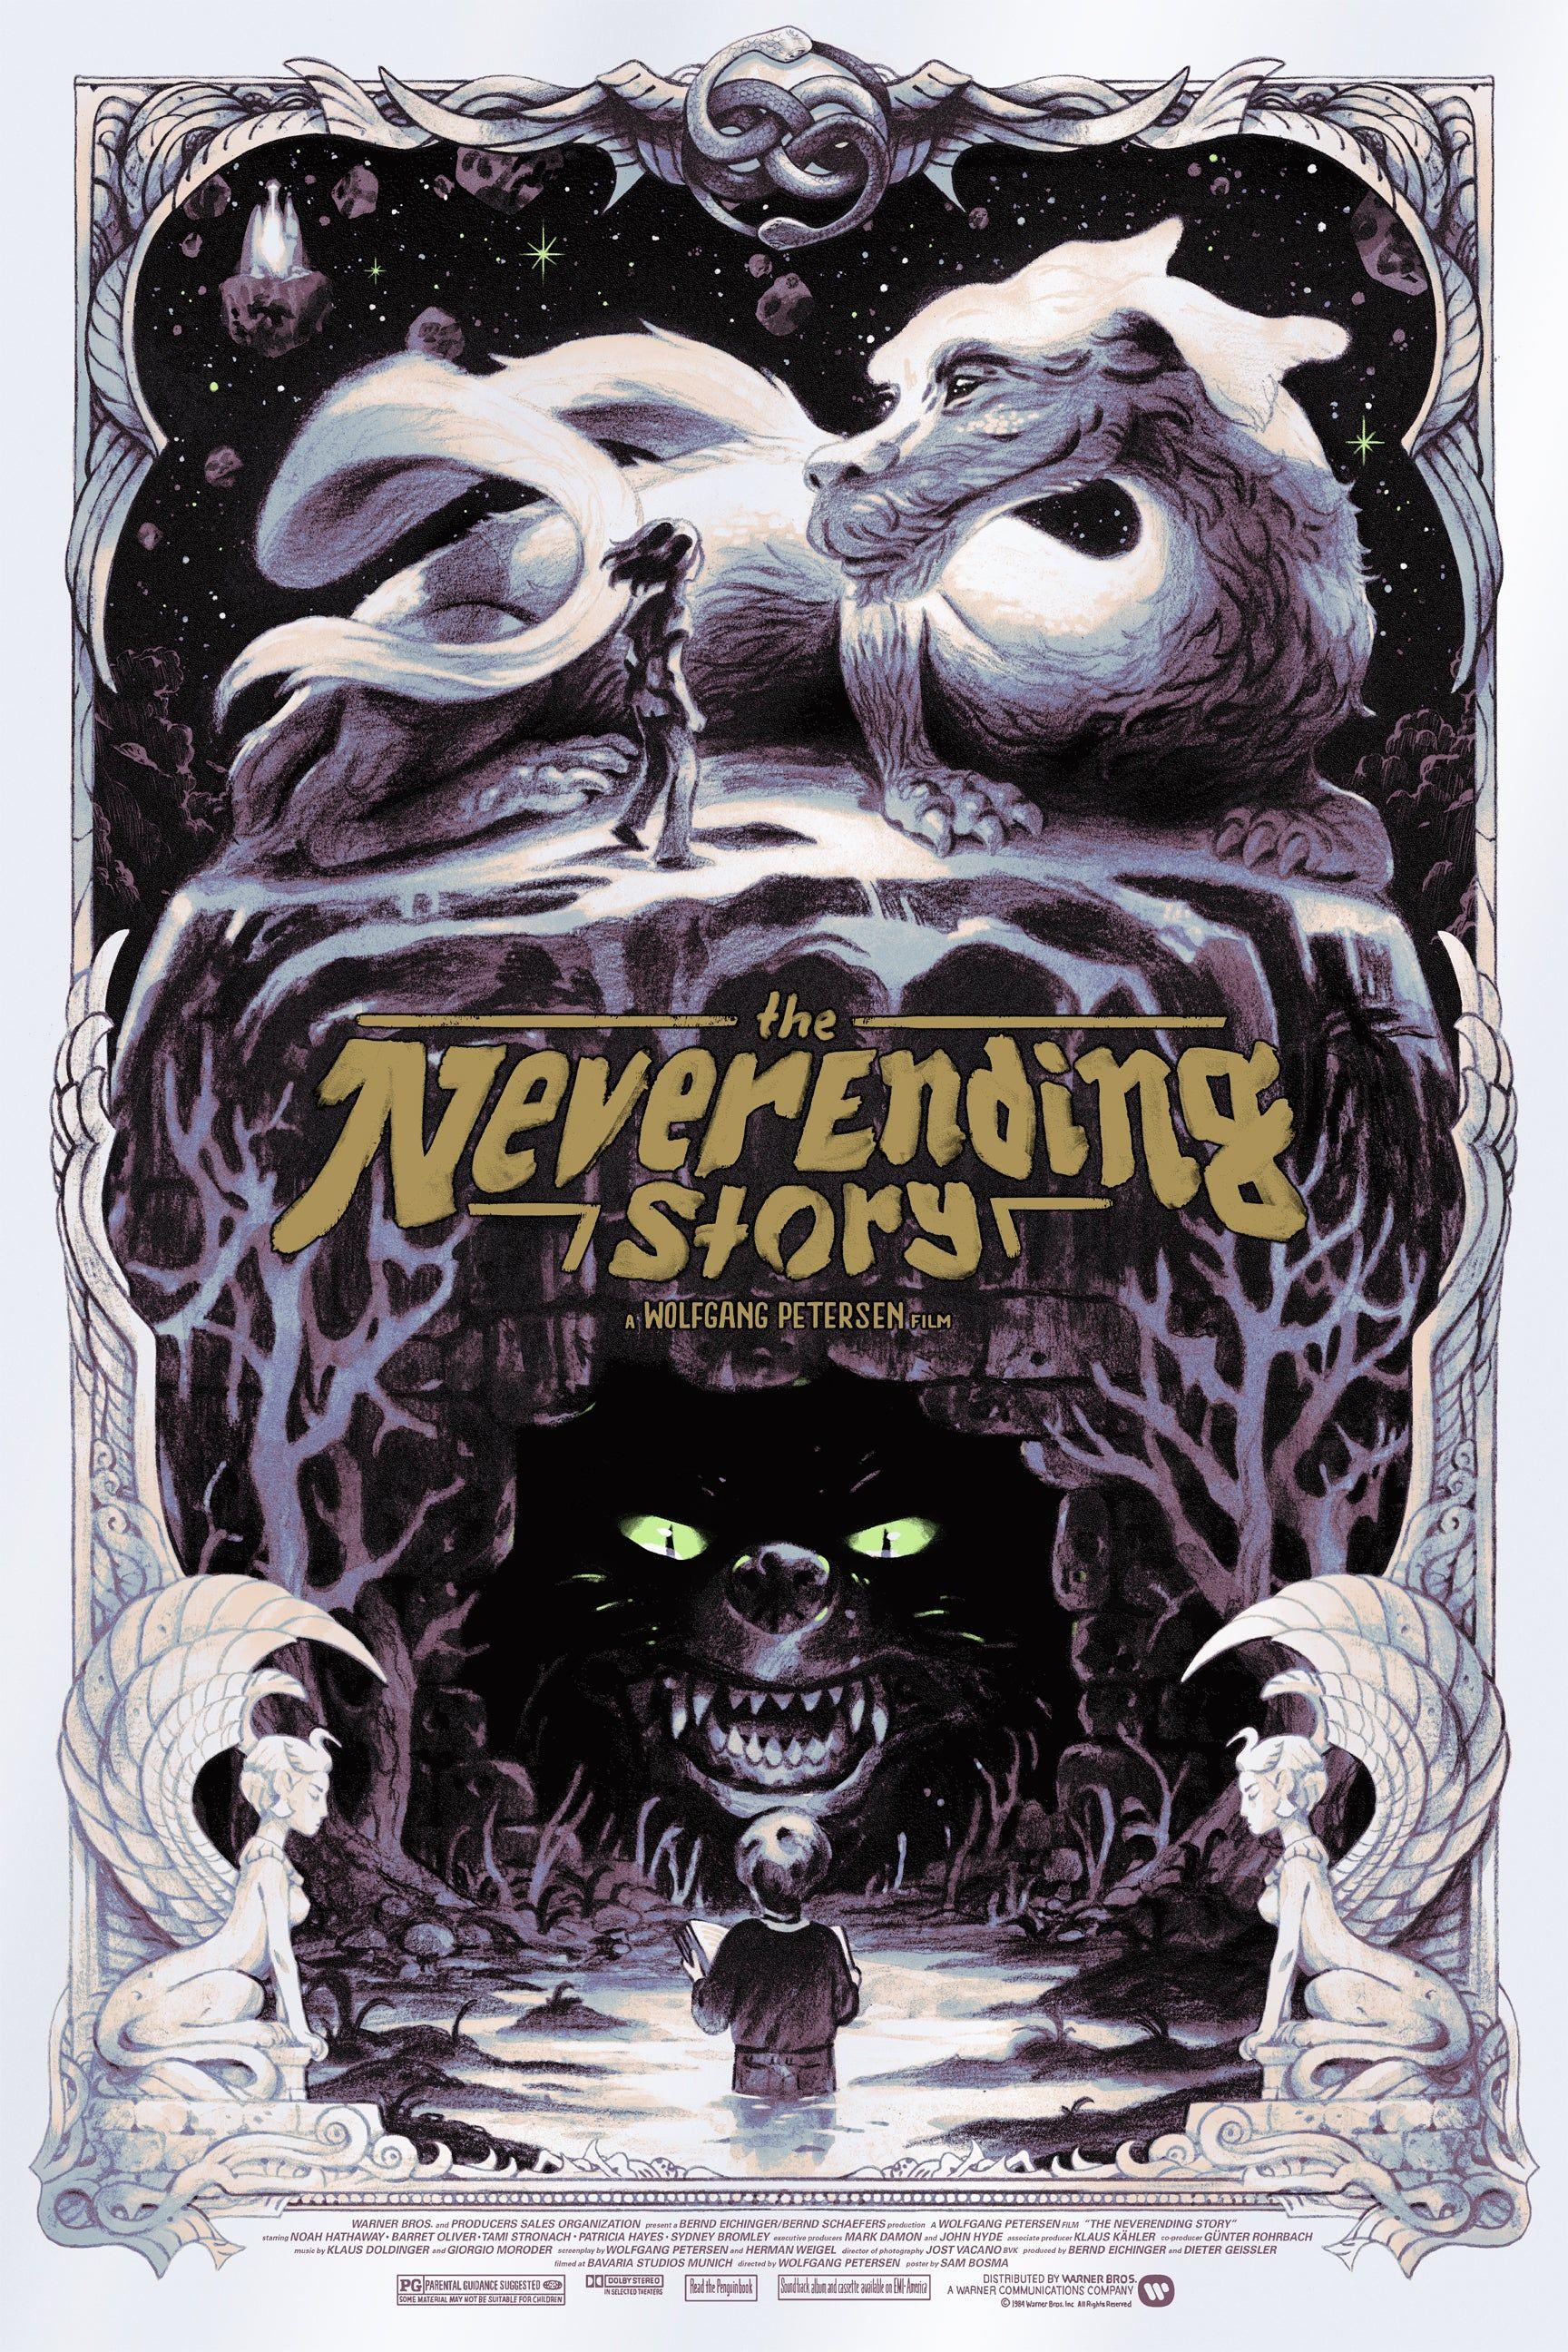 The Neverending Story 1984 17282592 By Sam Bosma Movie Posters Design Movie Poster Art Movie Posters Minimalist